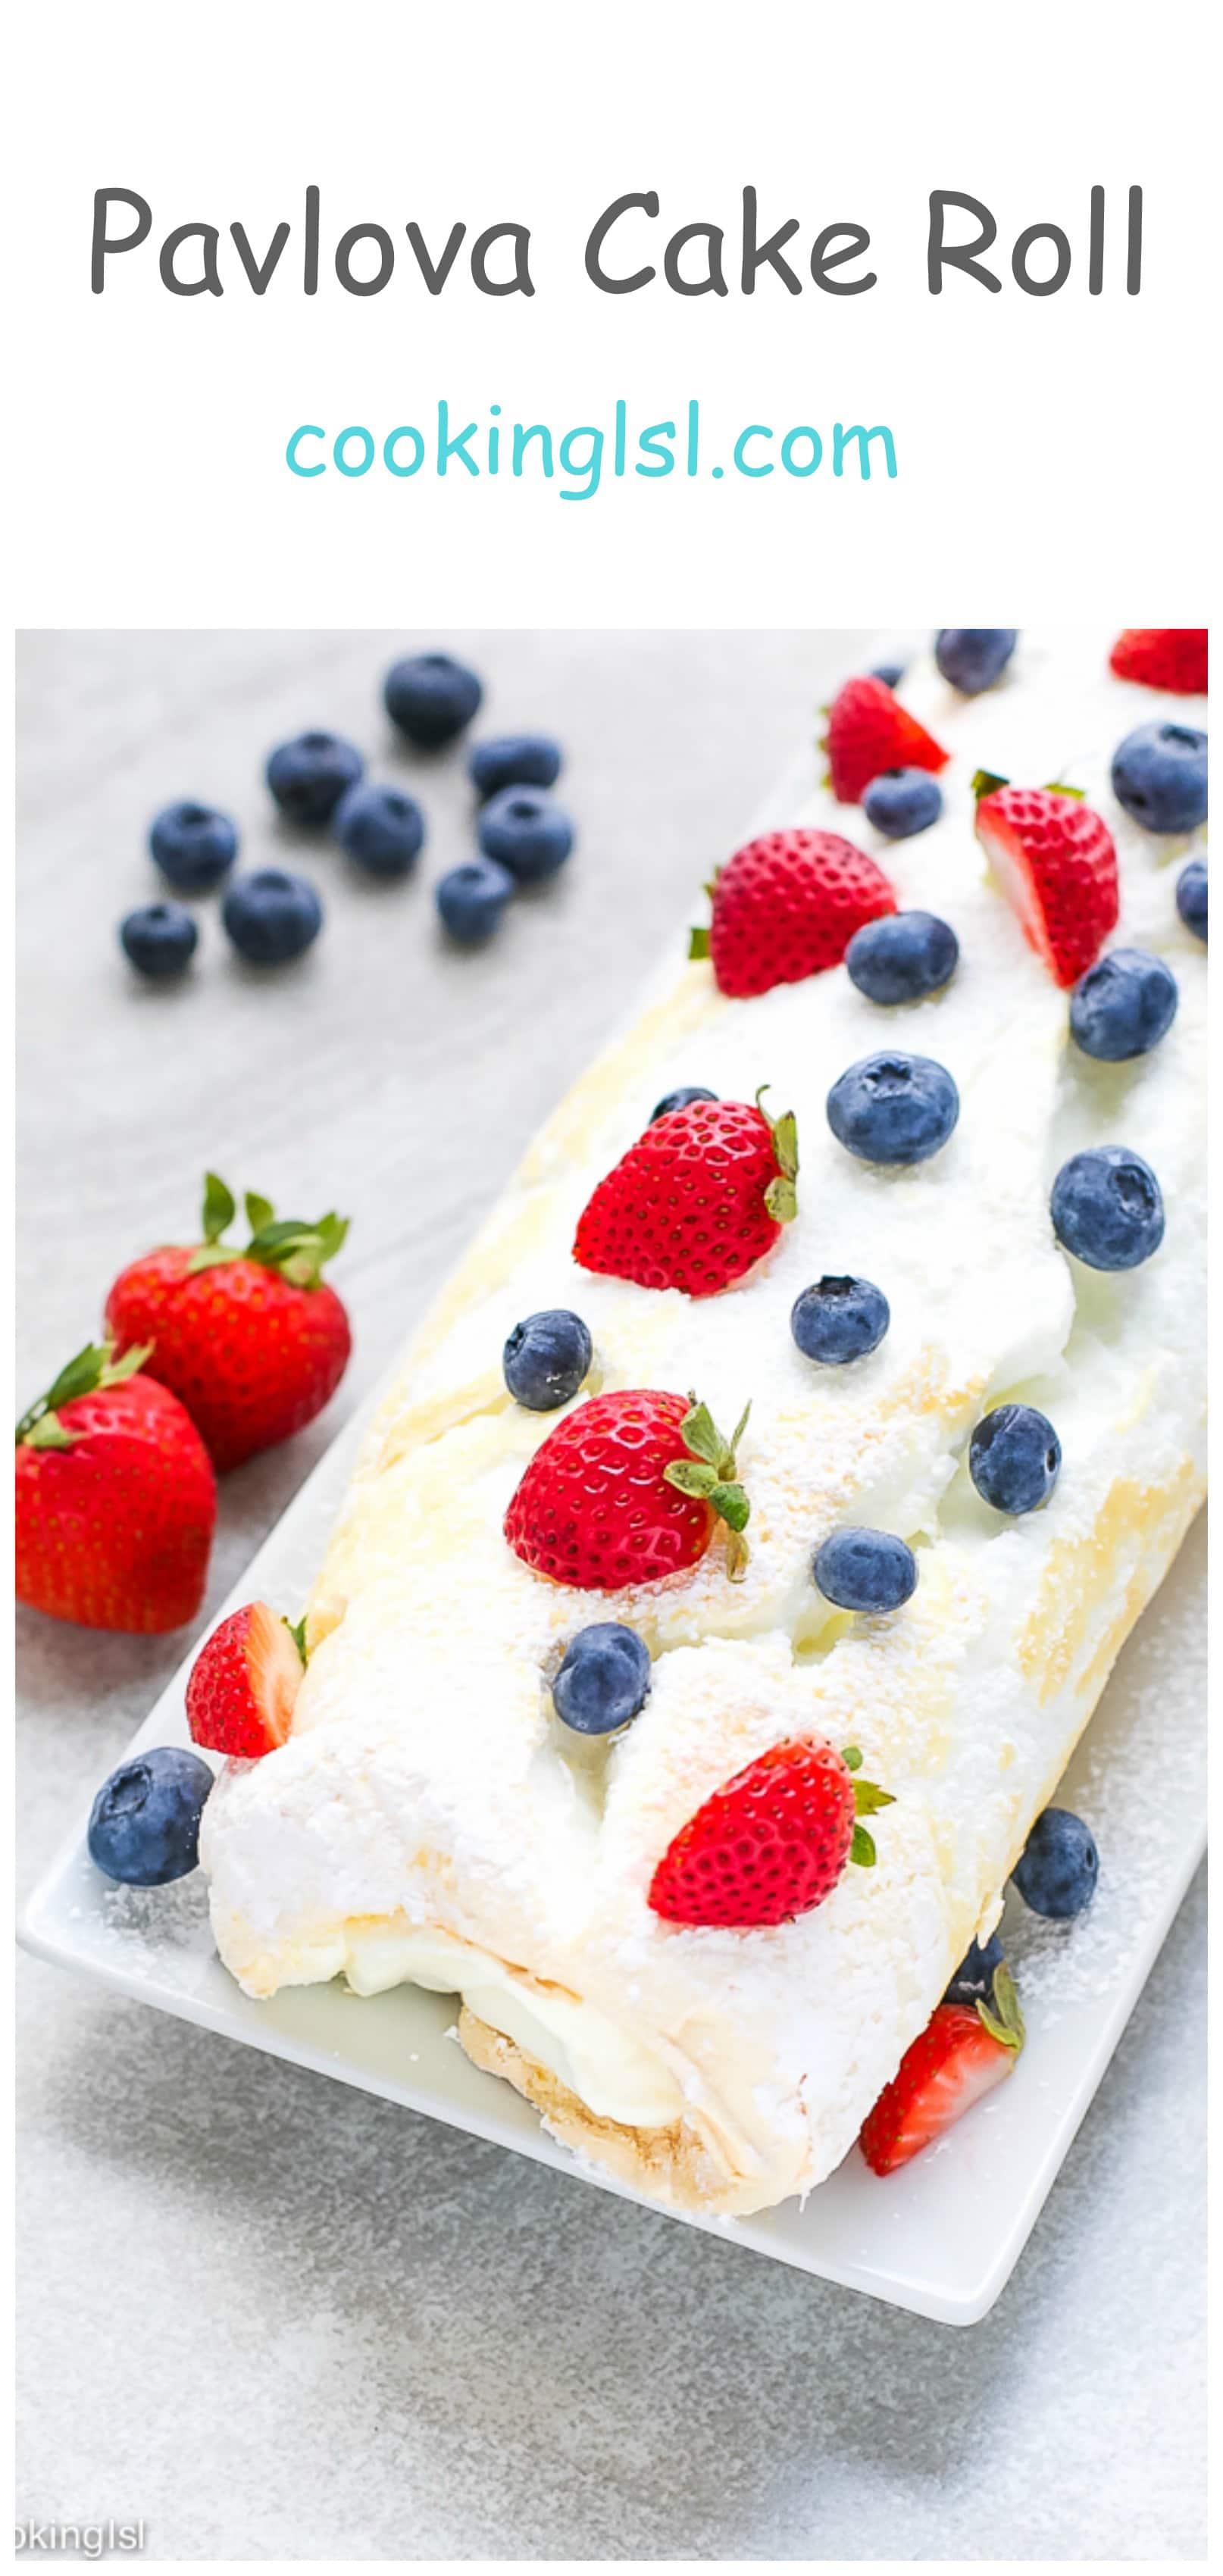 Pavlova-Cake-Roll